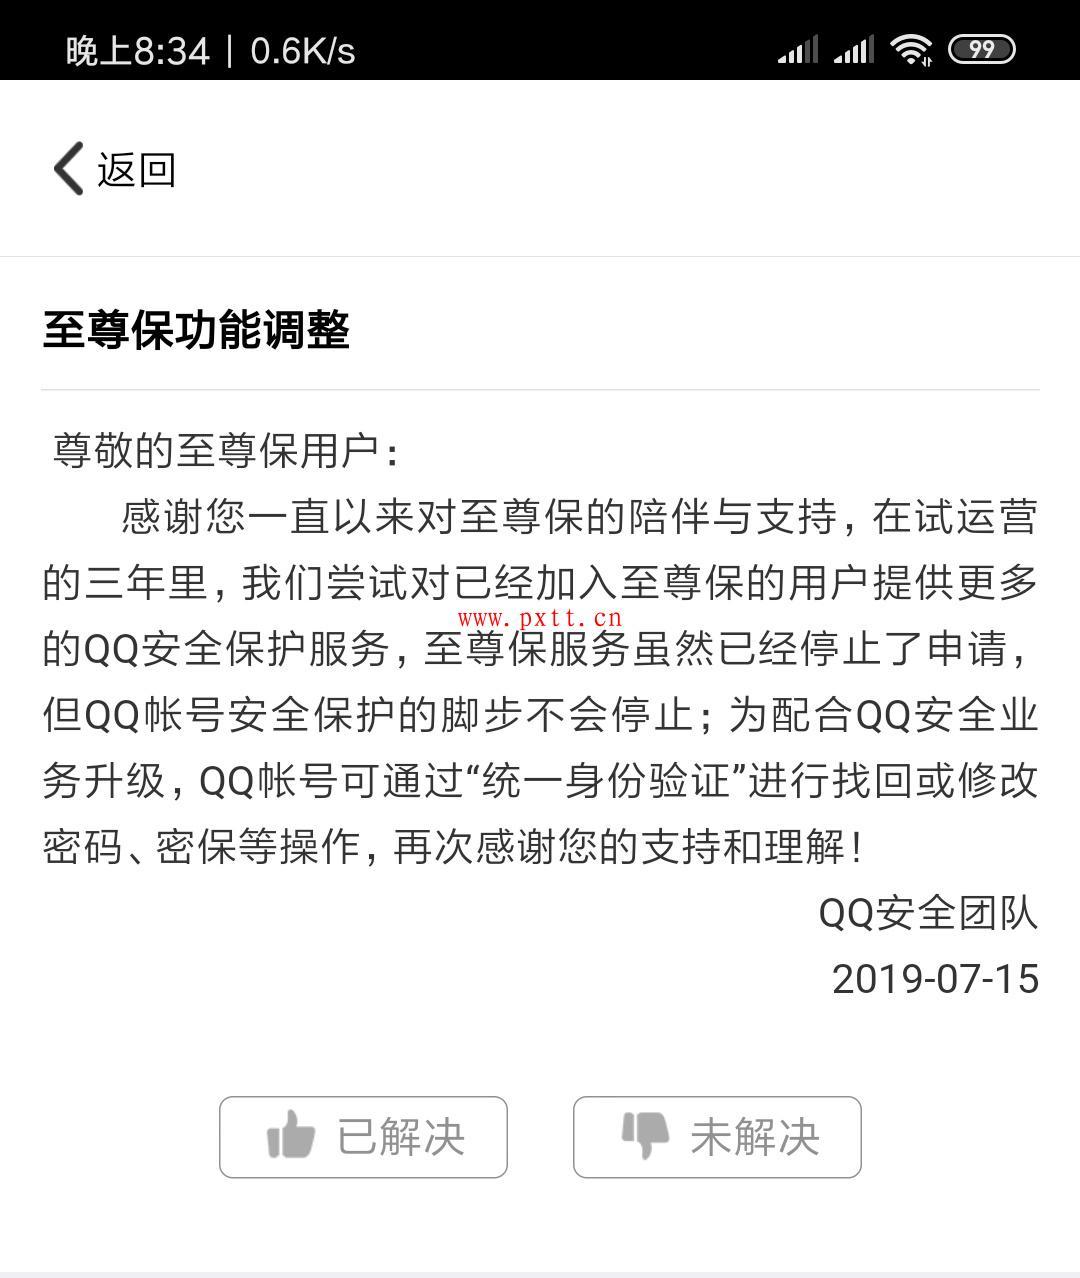 QQ至尊宝已经停止开通